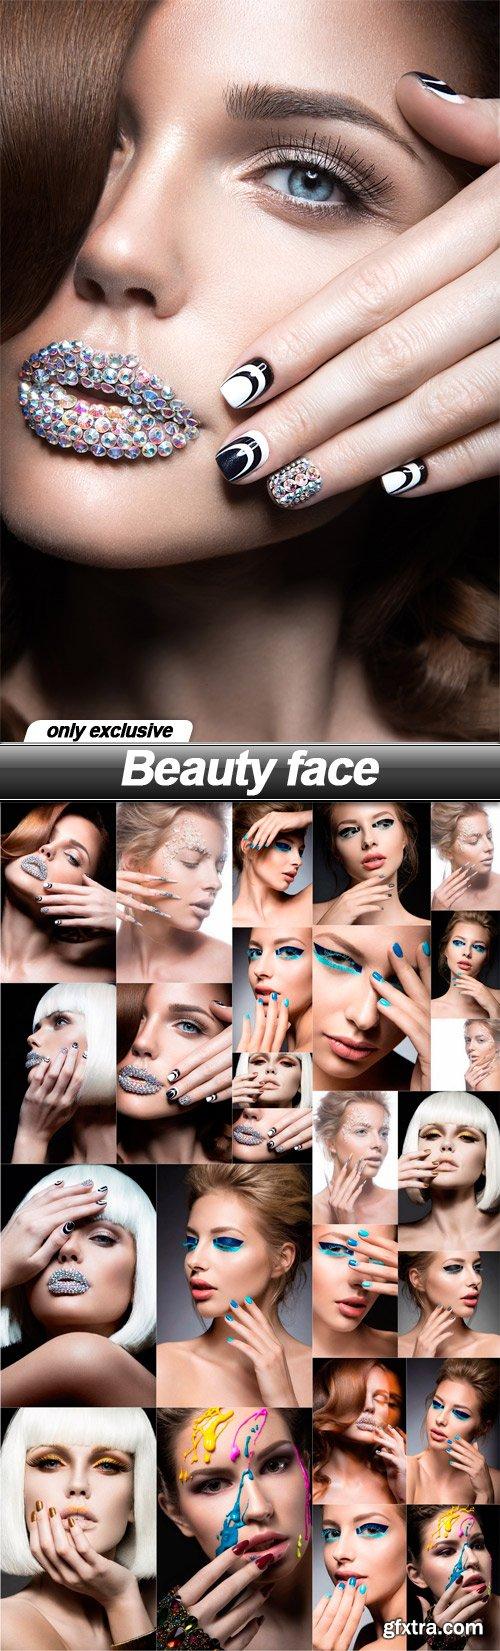 Beauty face - 25 UHQ JPEG